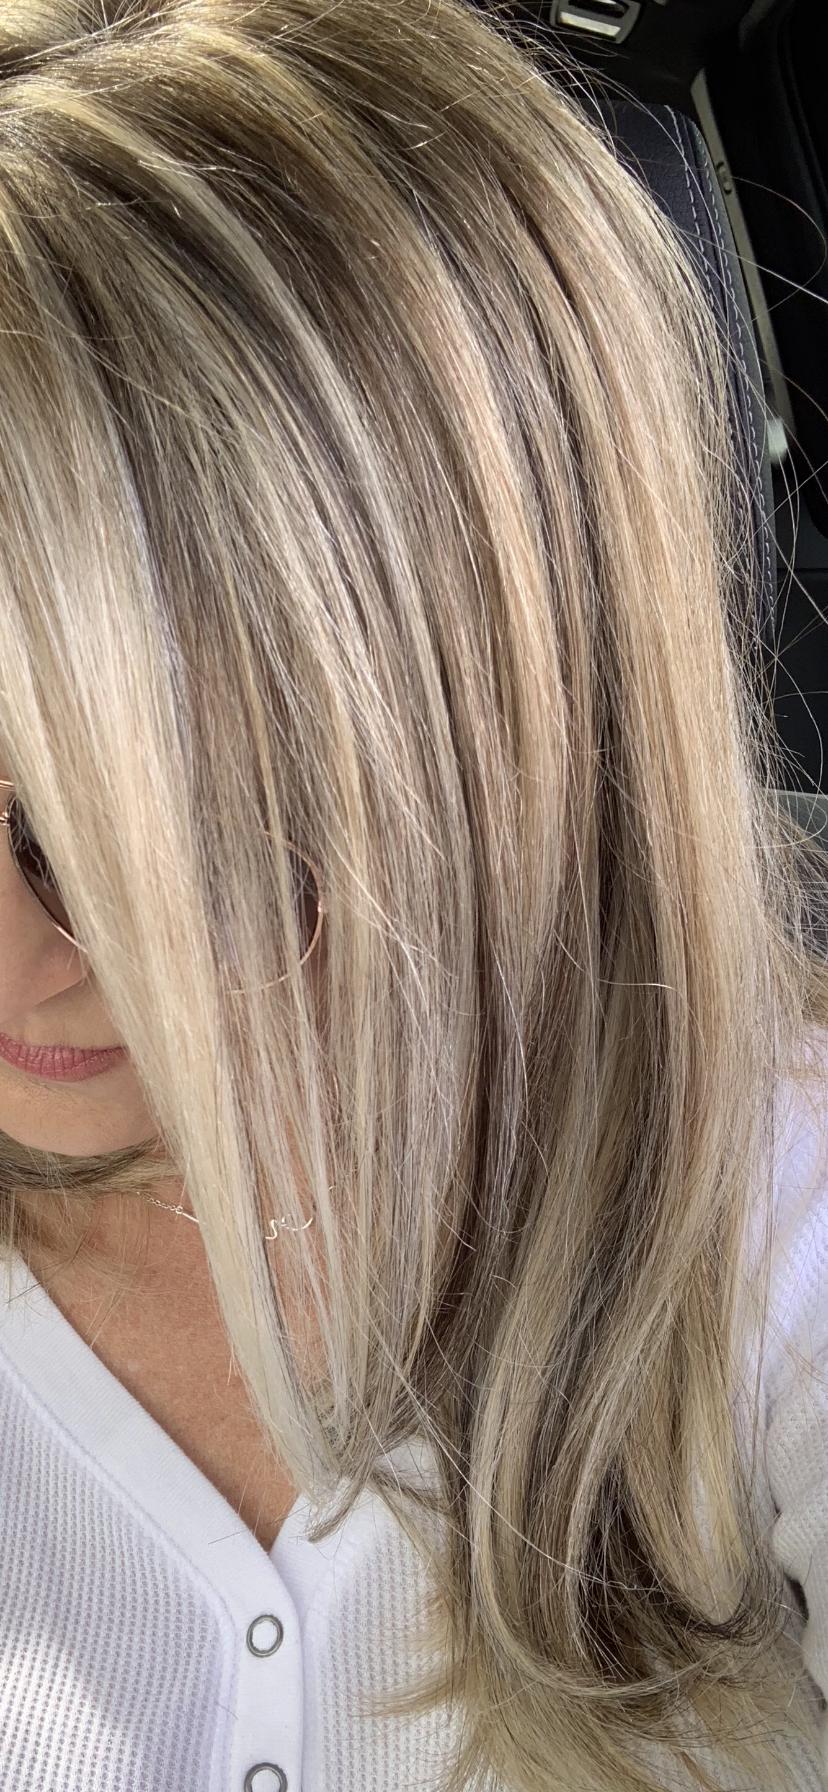 Karen Harman Hair Color Highlight Lowlight Hair Color Highlights Blonde Hair With Highlights Blonde Highlights With Lowlights